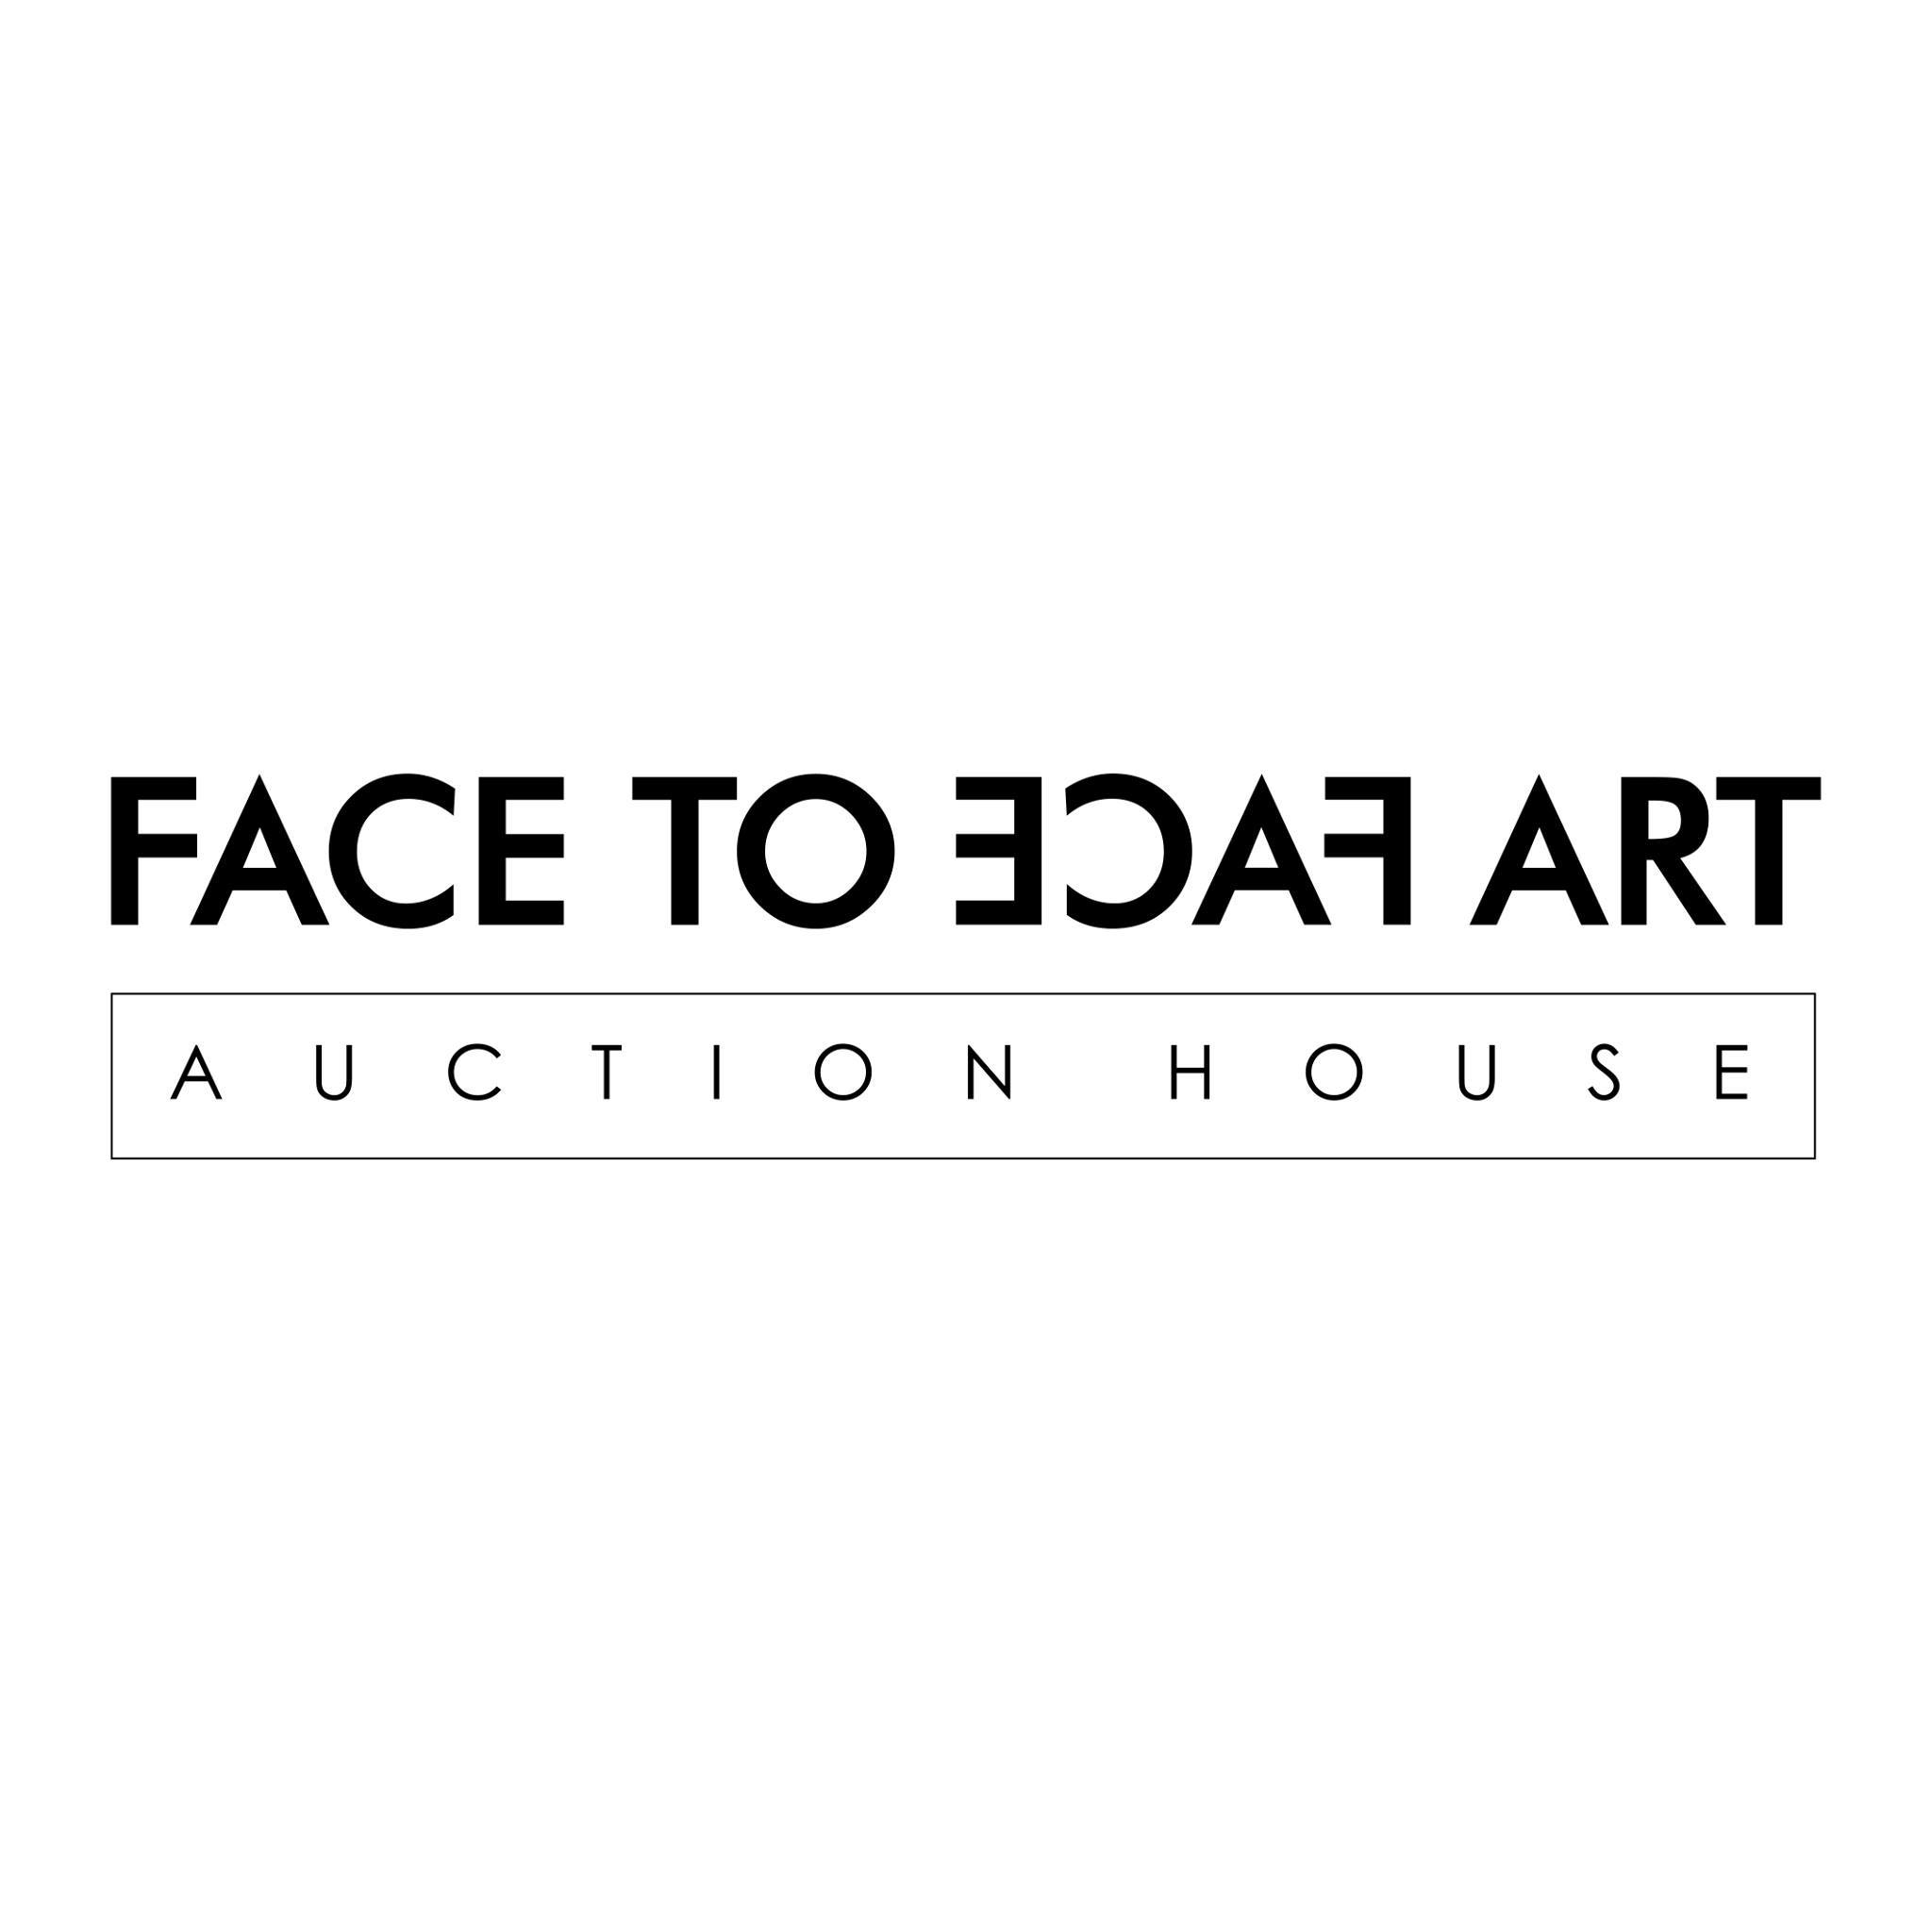 FaceToFaceArt